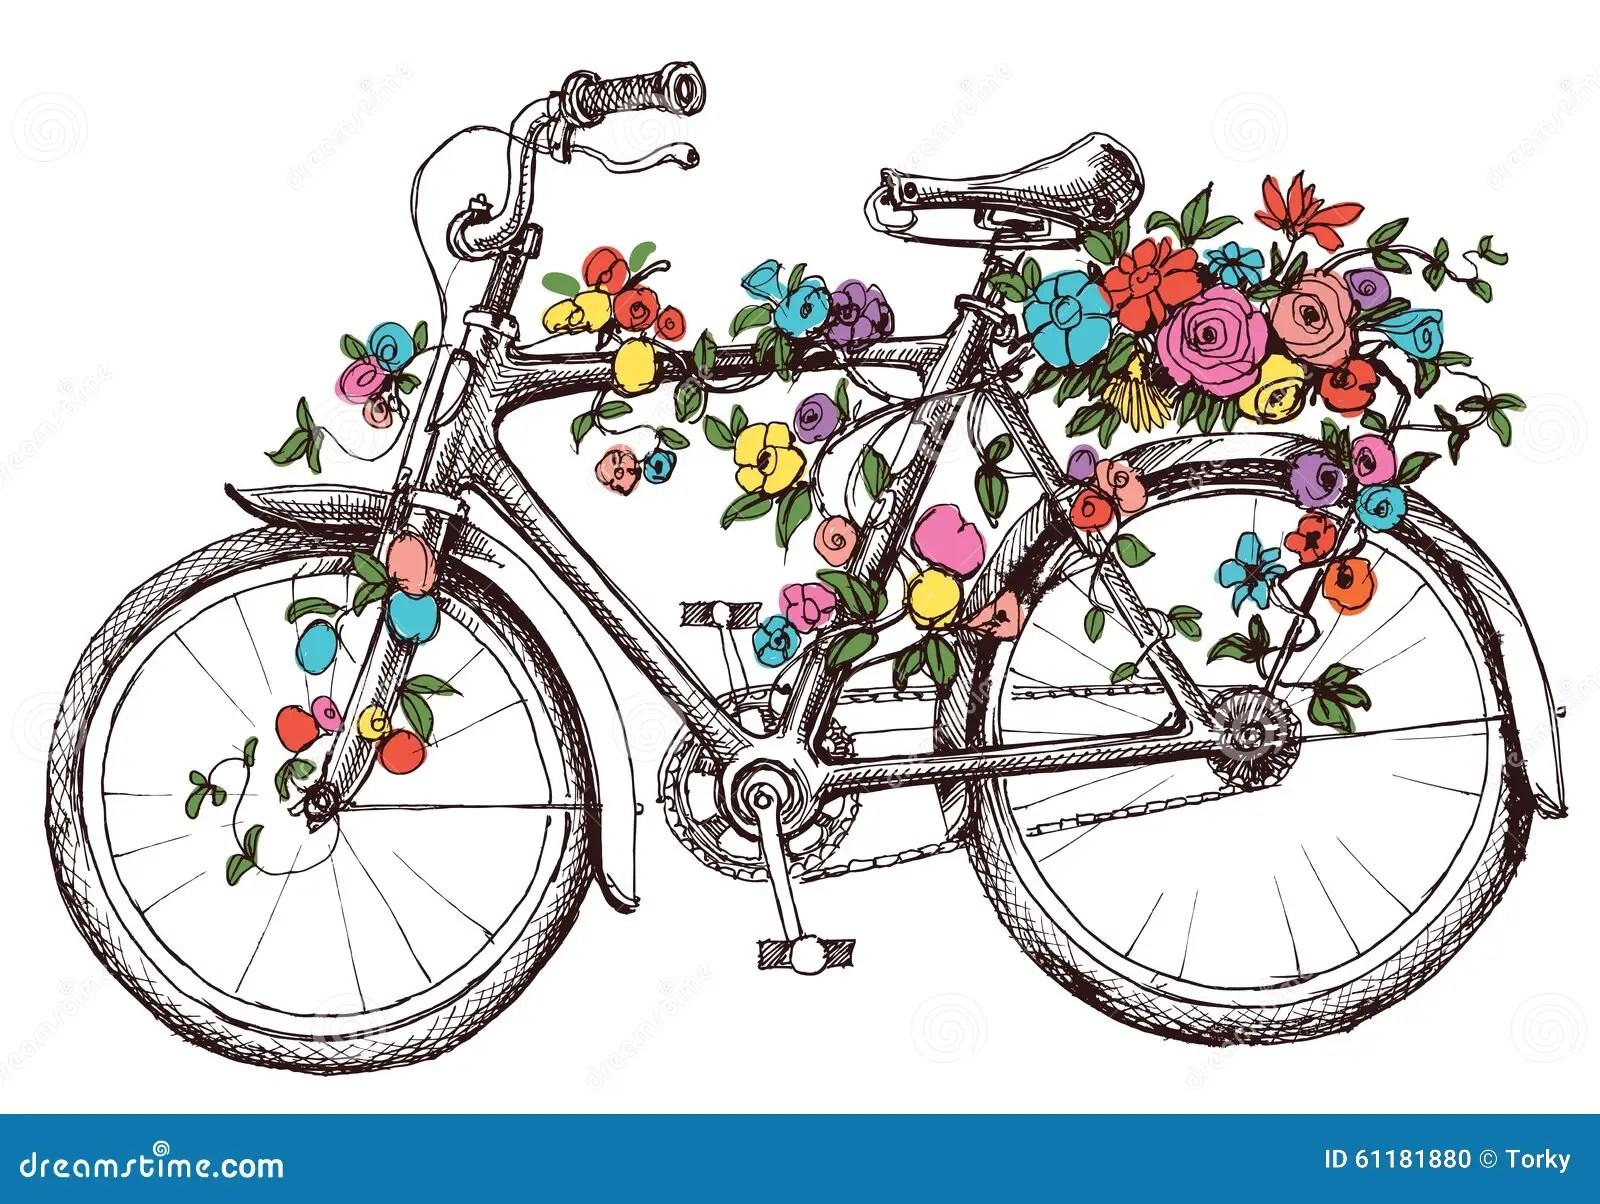 Fahrrad Mit Blumen Vektor Abbildung  Bild 61181880